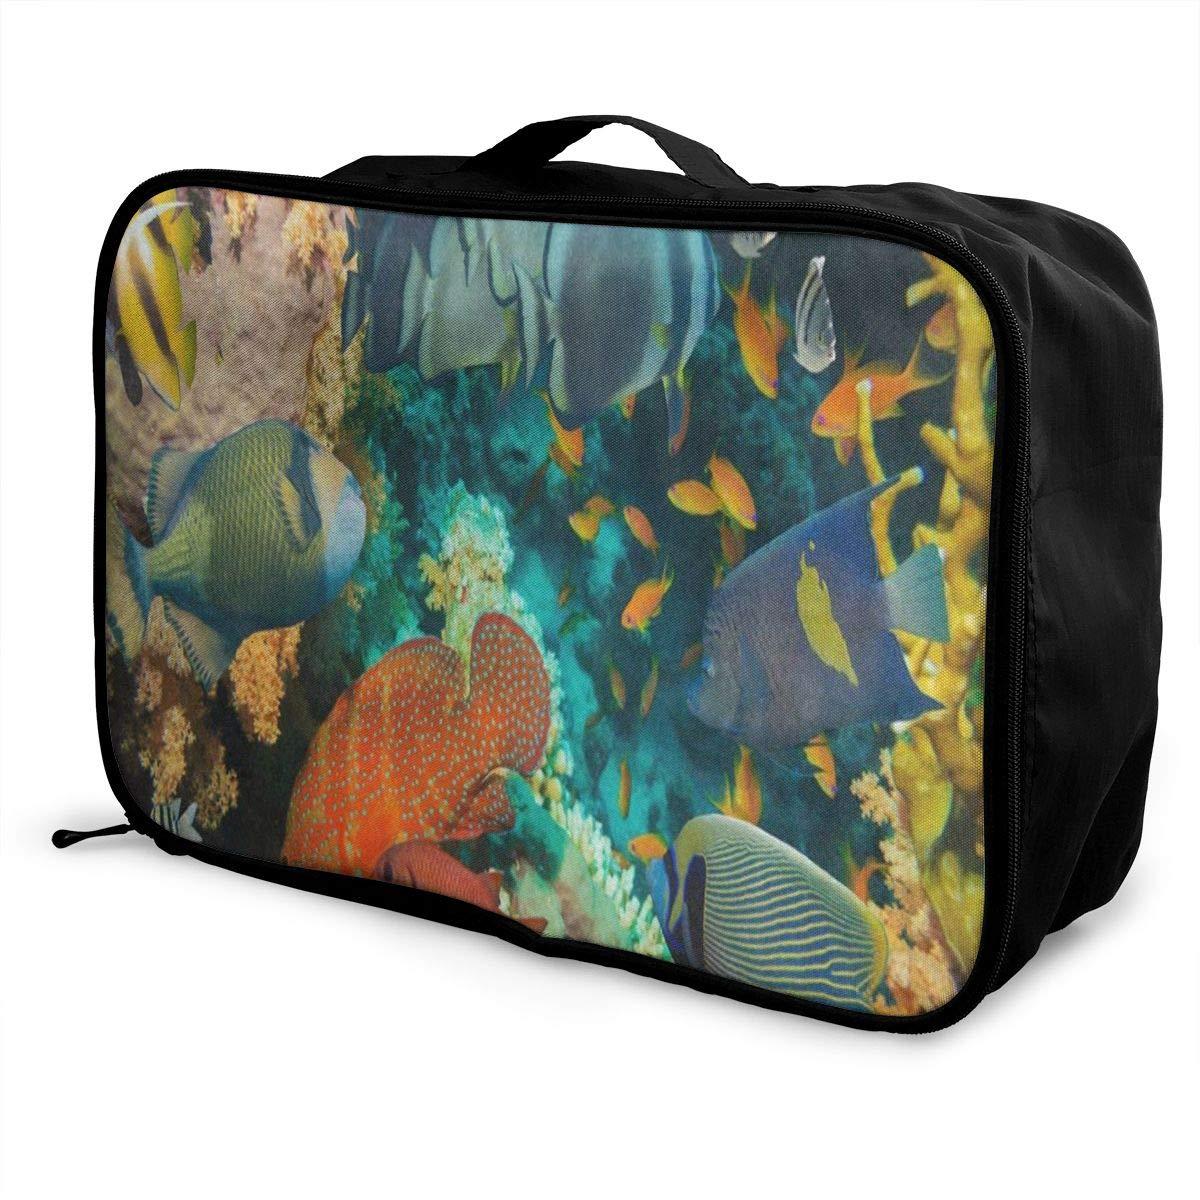 Travel Bags One Flamingo Bird On Beach Portable Foldable Marvellous Trolley Handle Luggage Bag